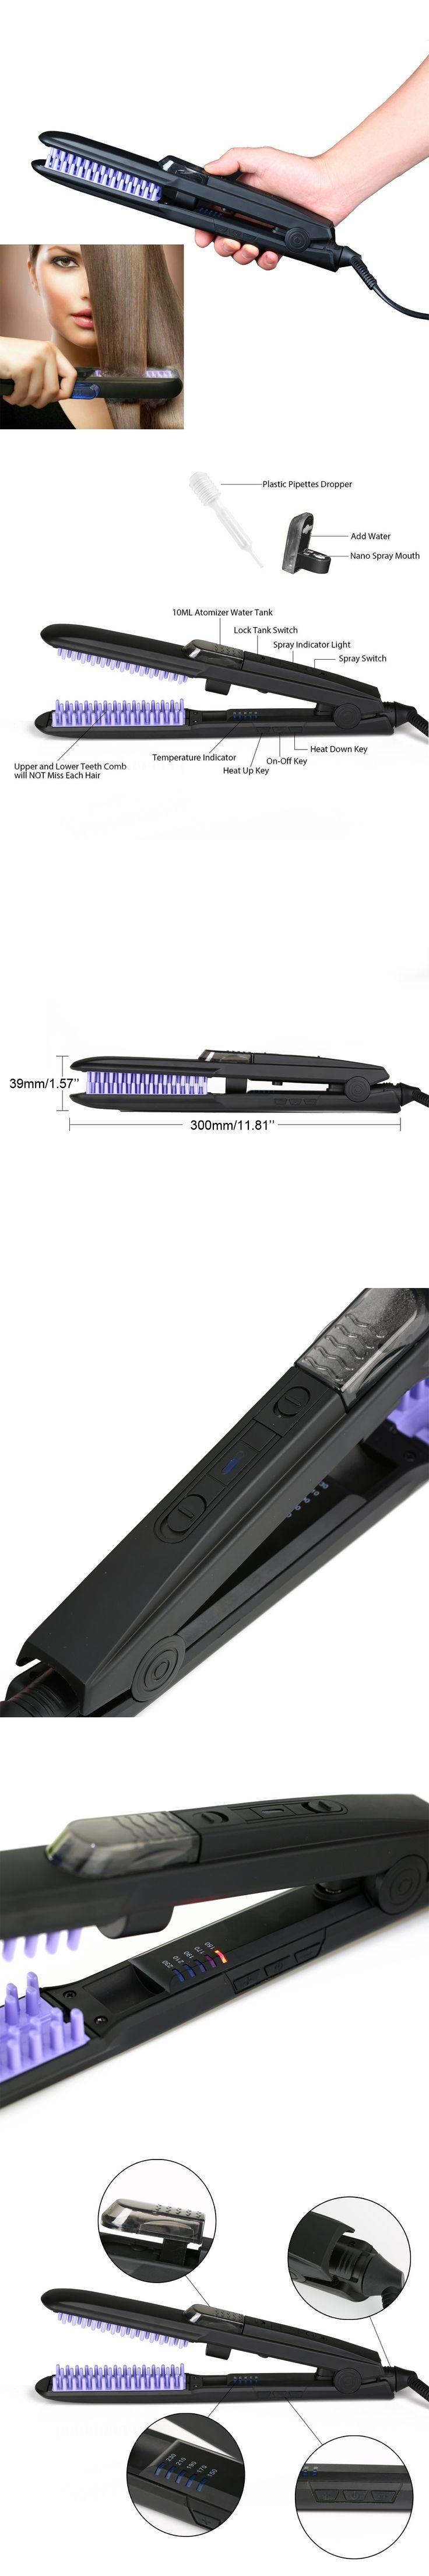 Faster Heating Straightening Brushes  Irons Women Steam Hair Straightener Brush Comb Hair Care For Home Dating Travel Salon HB8